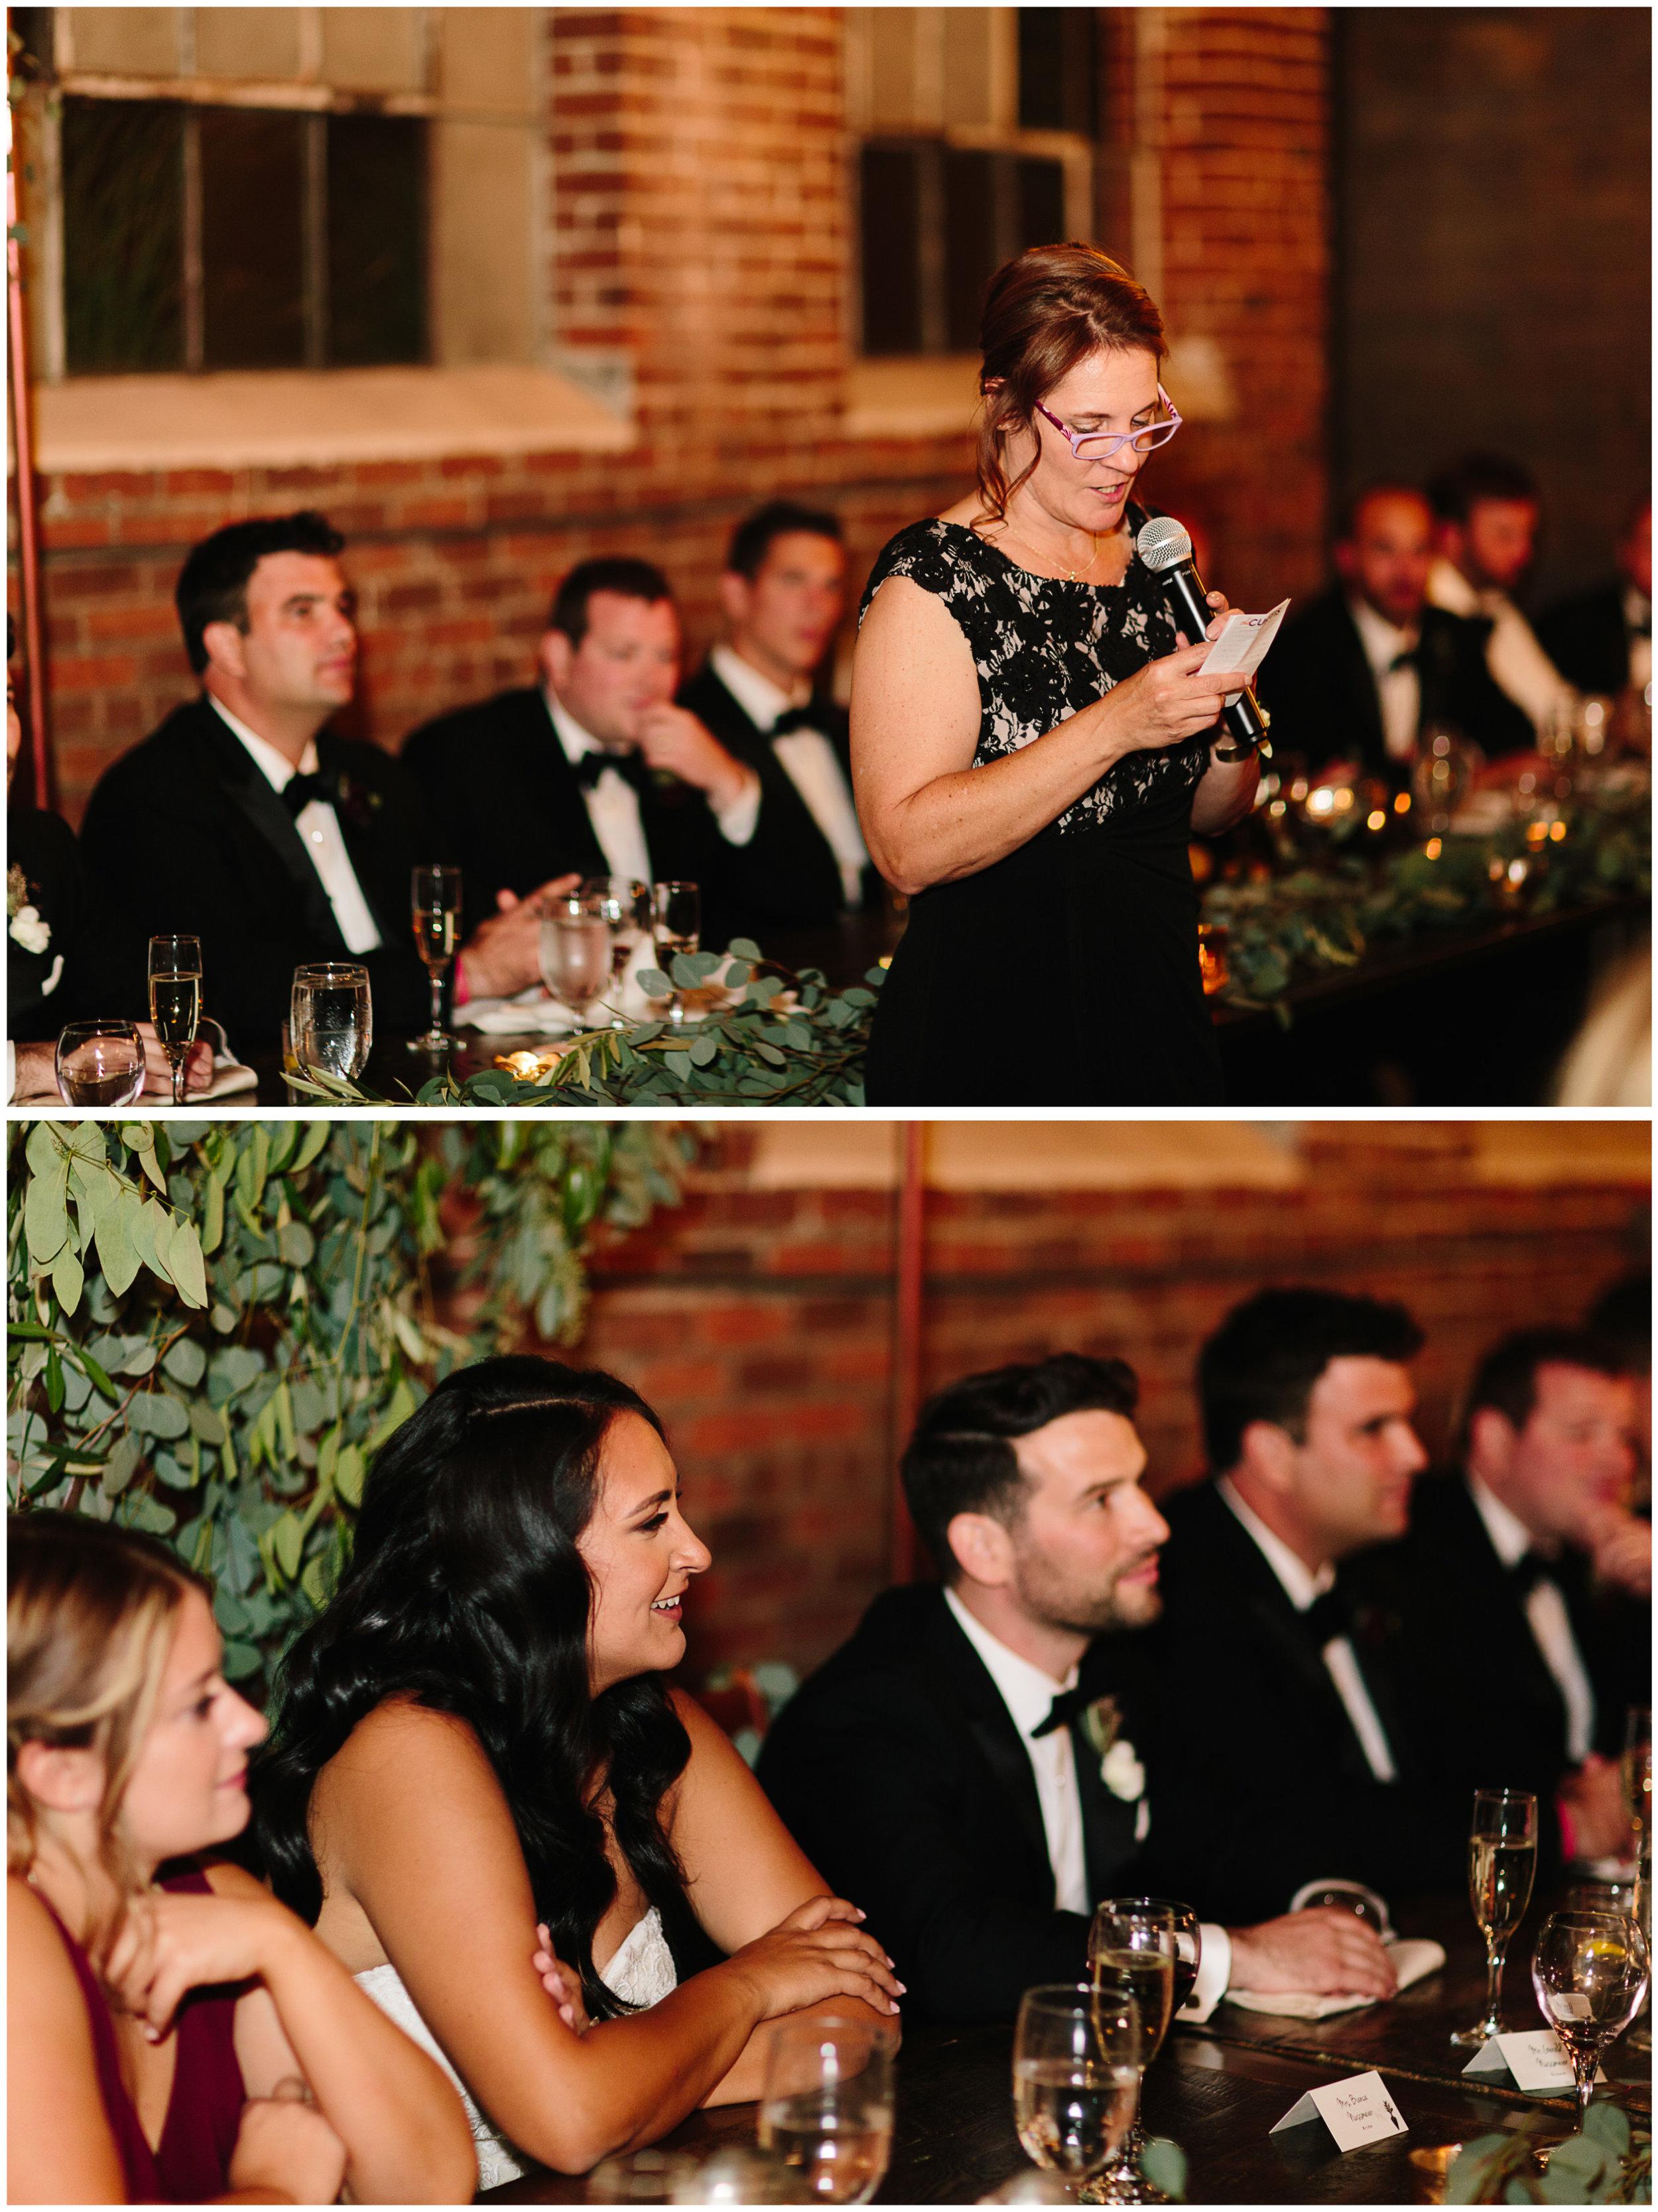 moss_denver_wedding_71.jpg